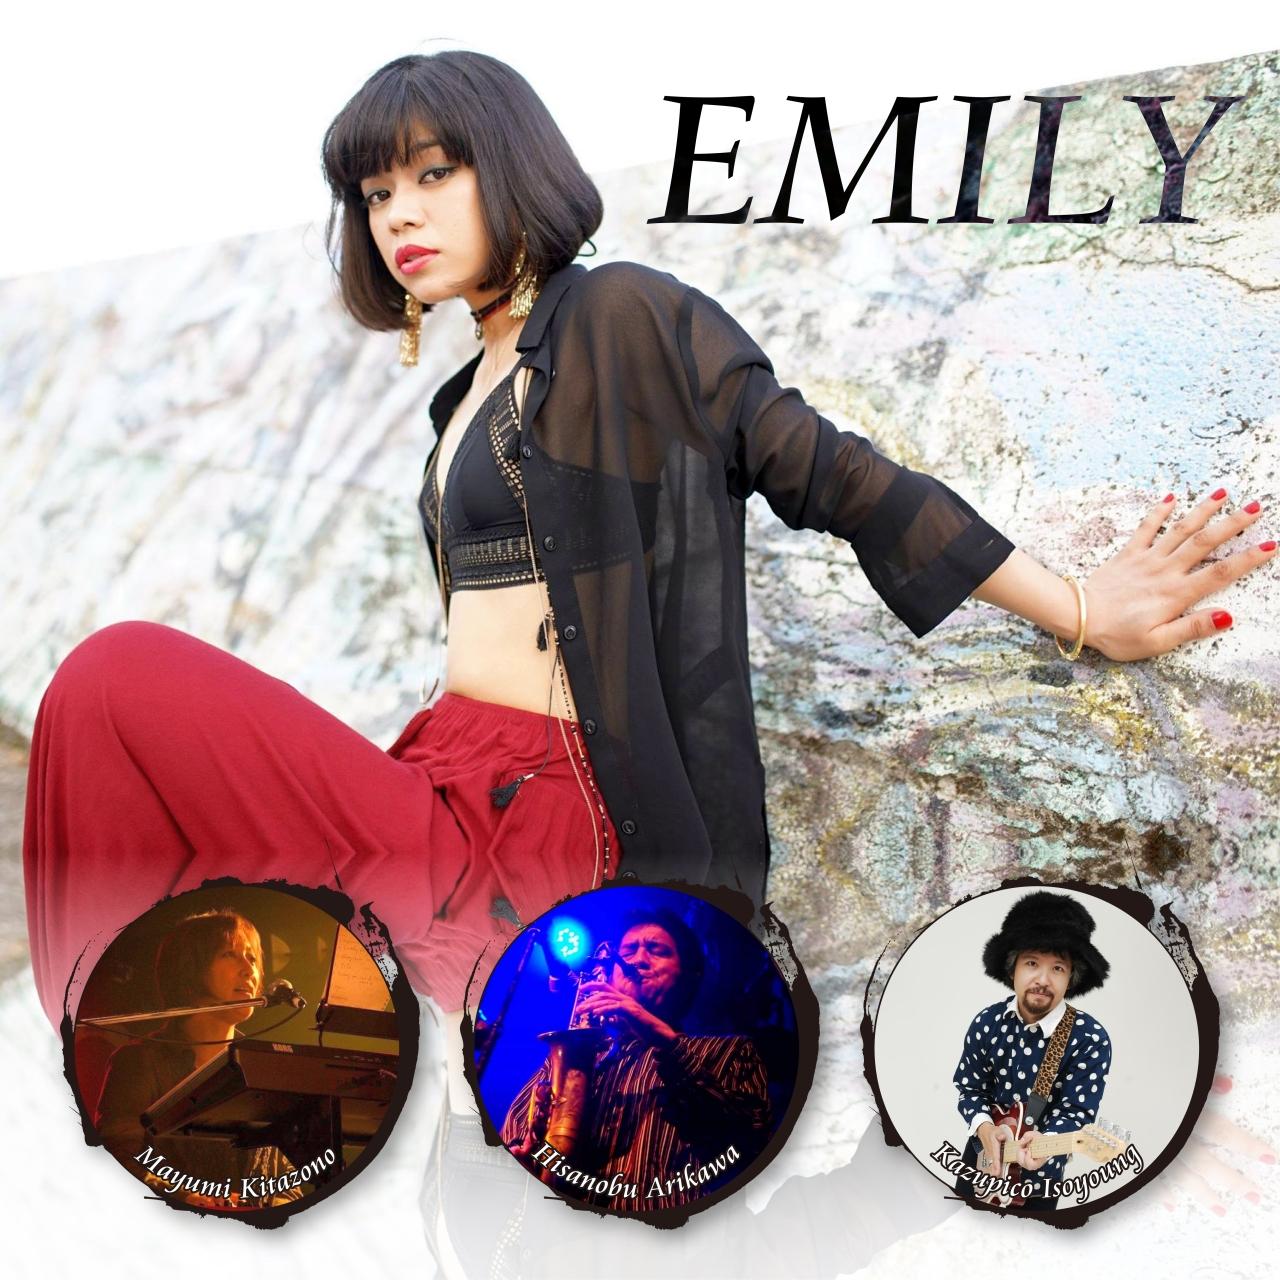 EMILY & The Delightful Gang (仮名)